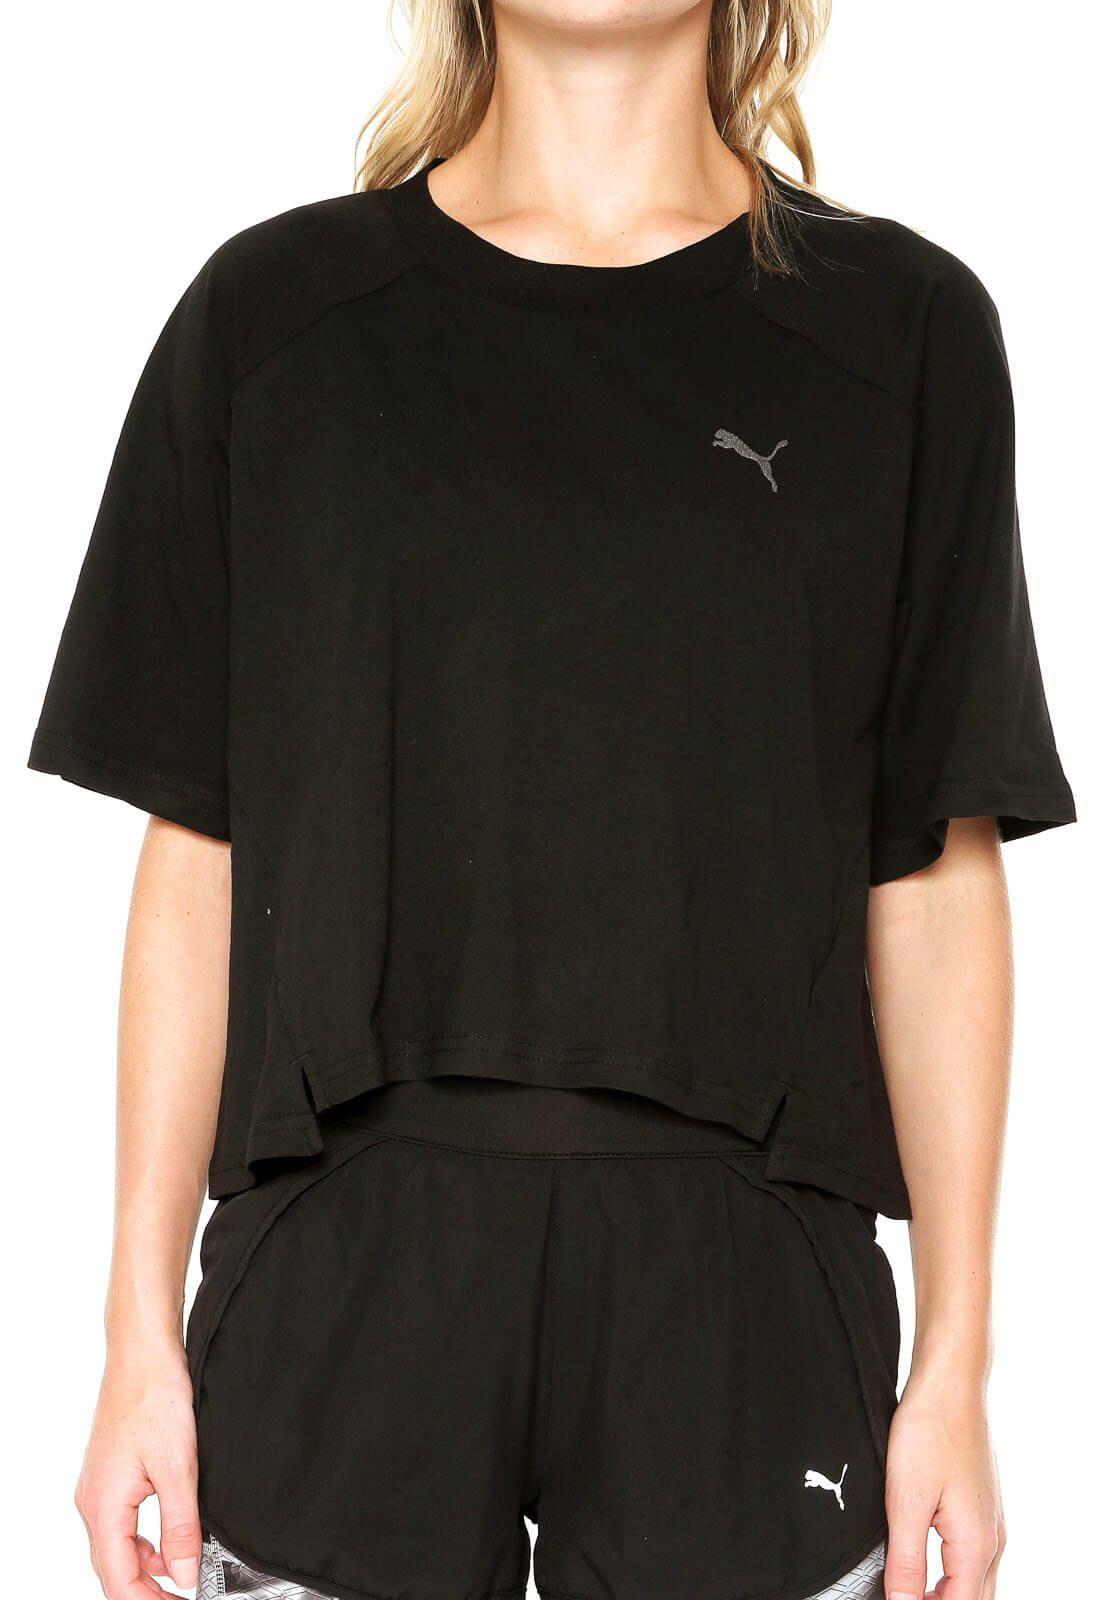 Camiseta Feminina Puma Transition Tee